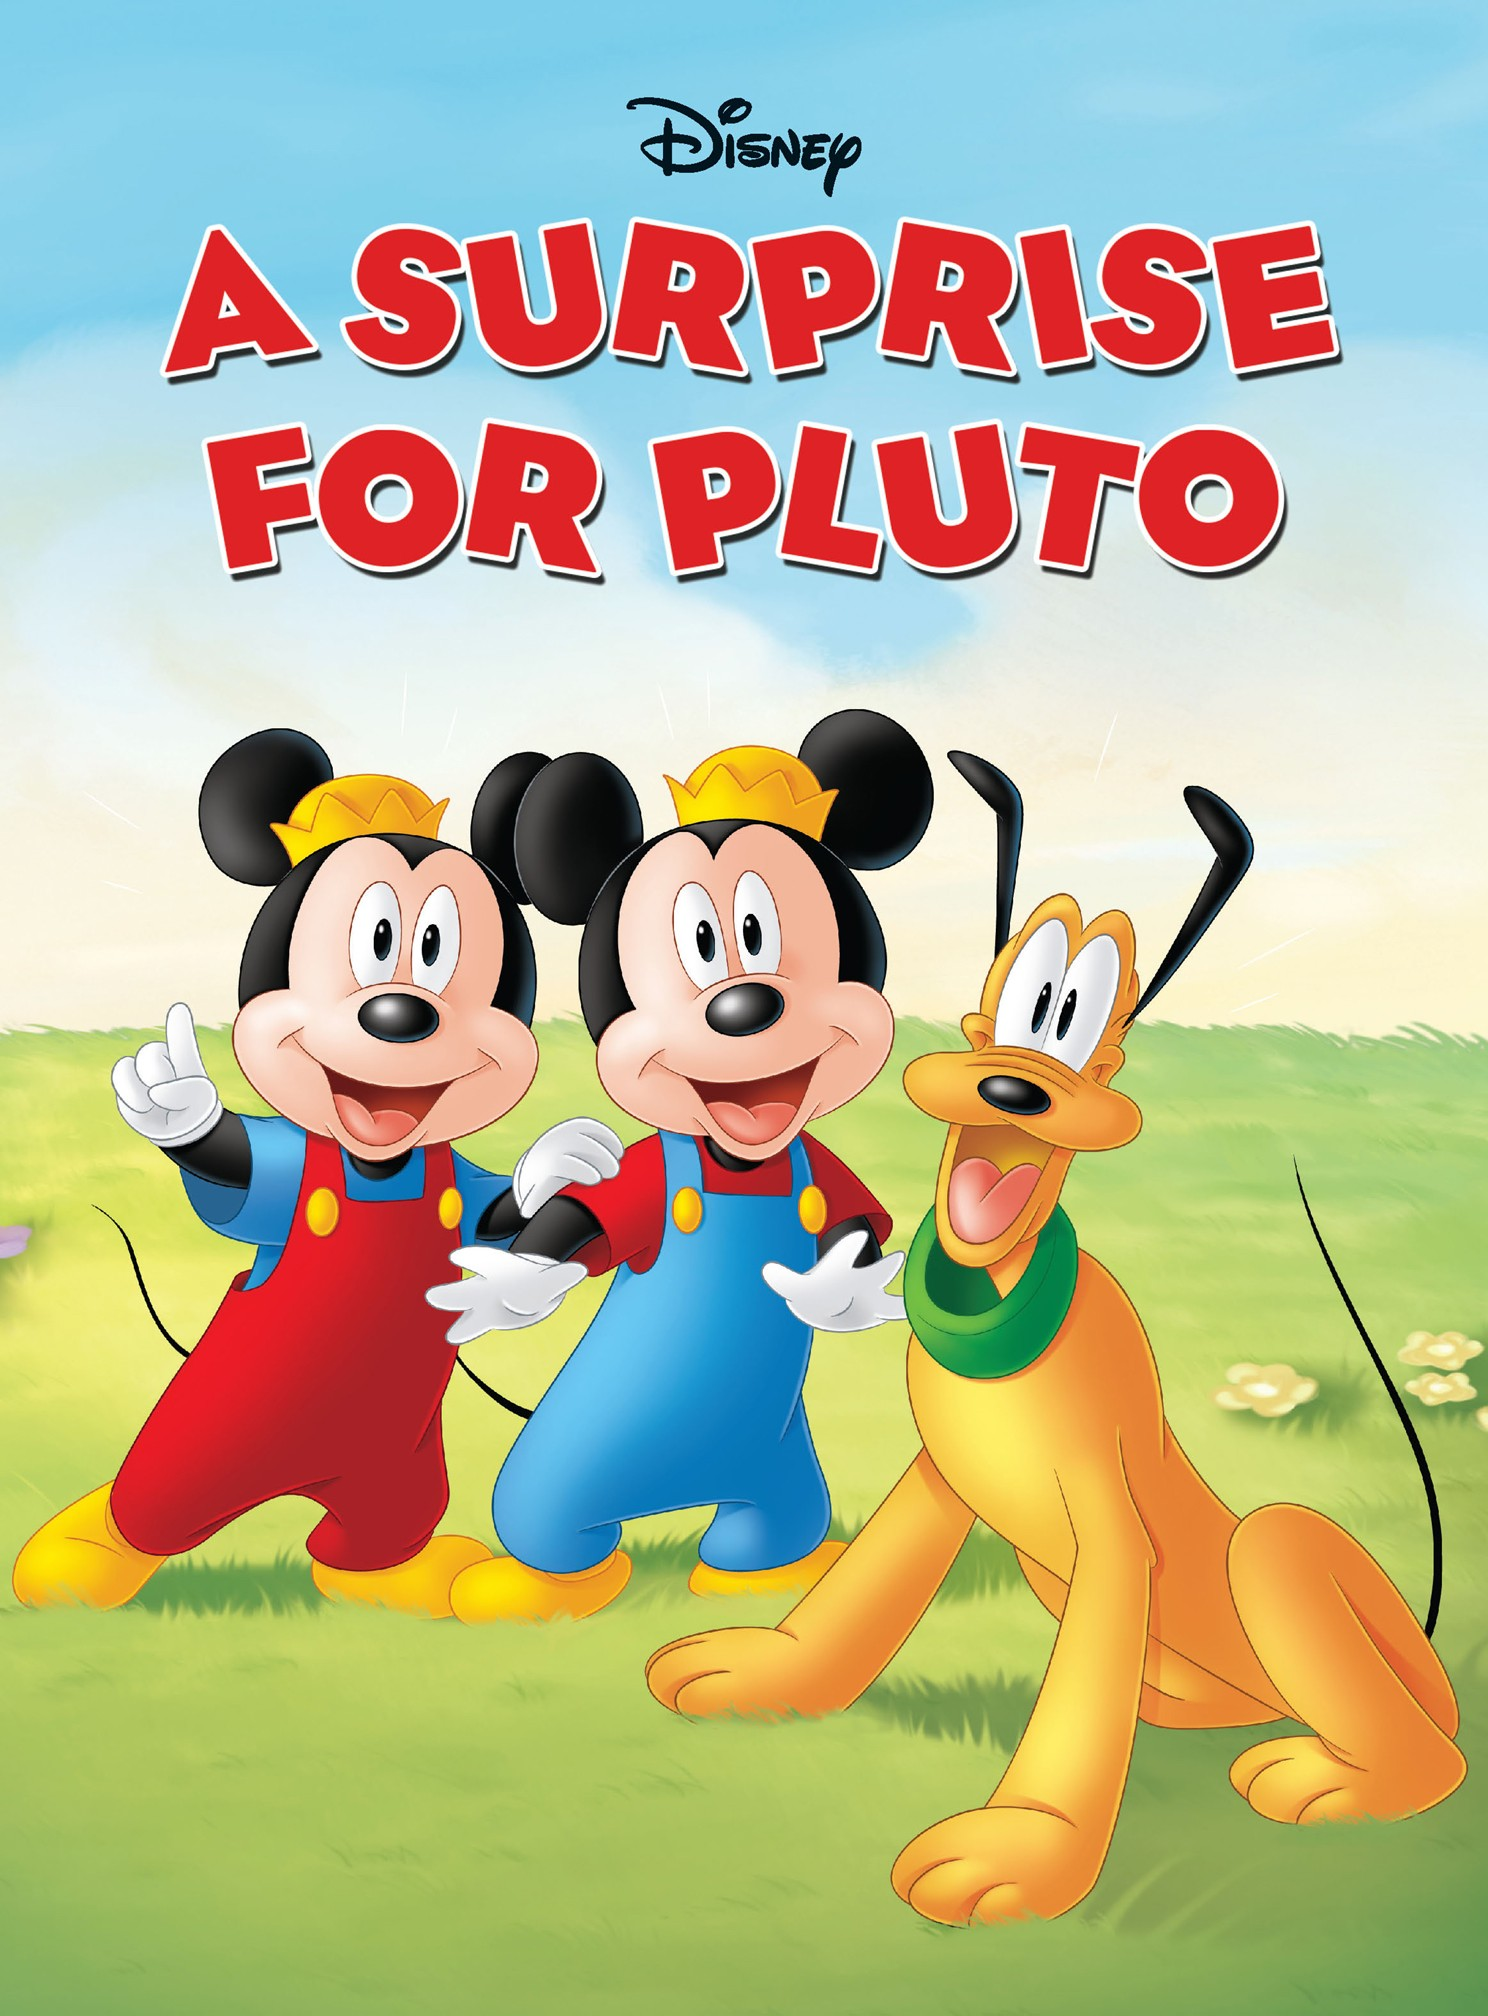 A Surprise for Pluto